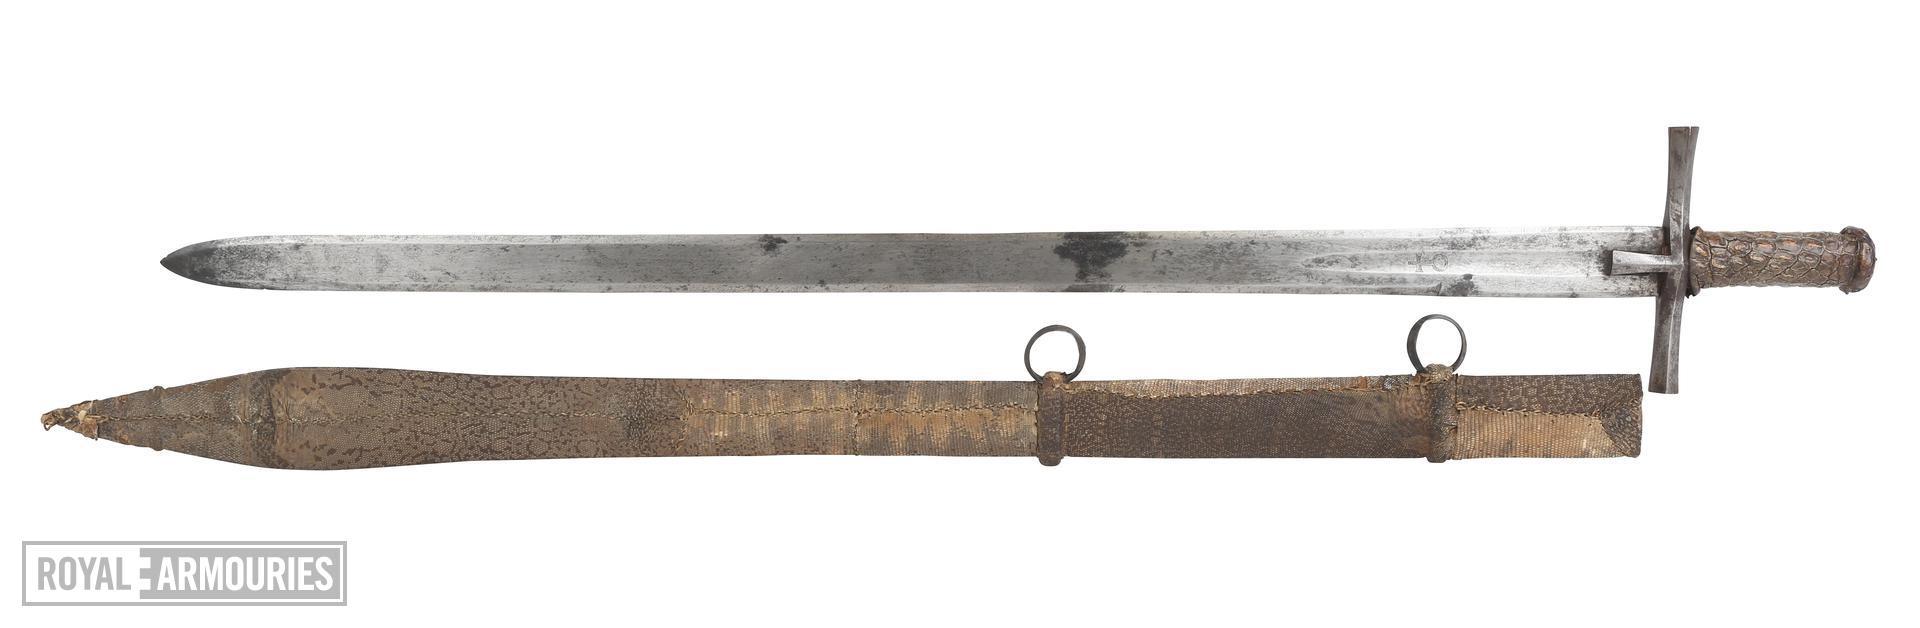 Sword (kaskara) and scabbard - Kaskara